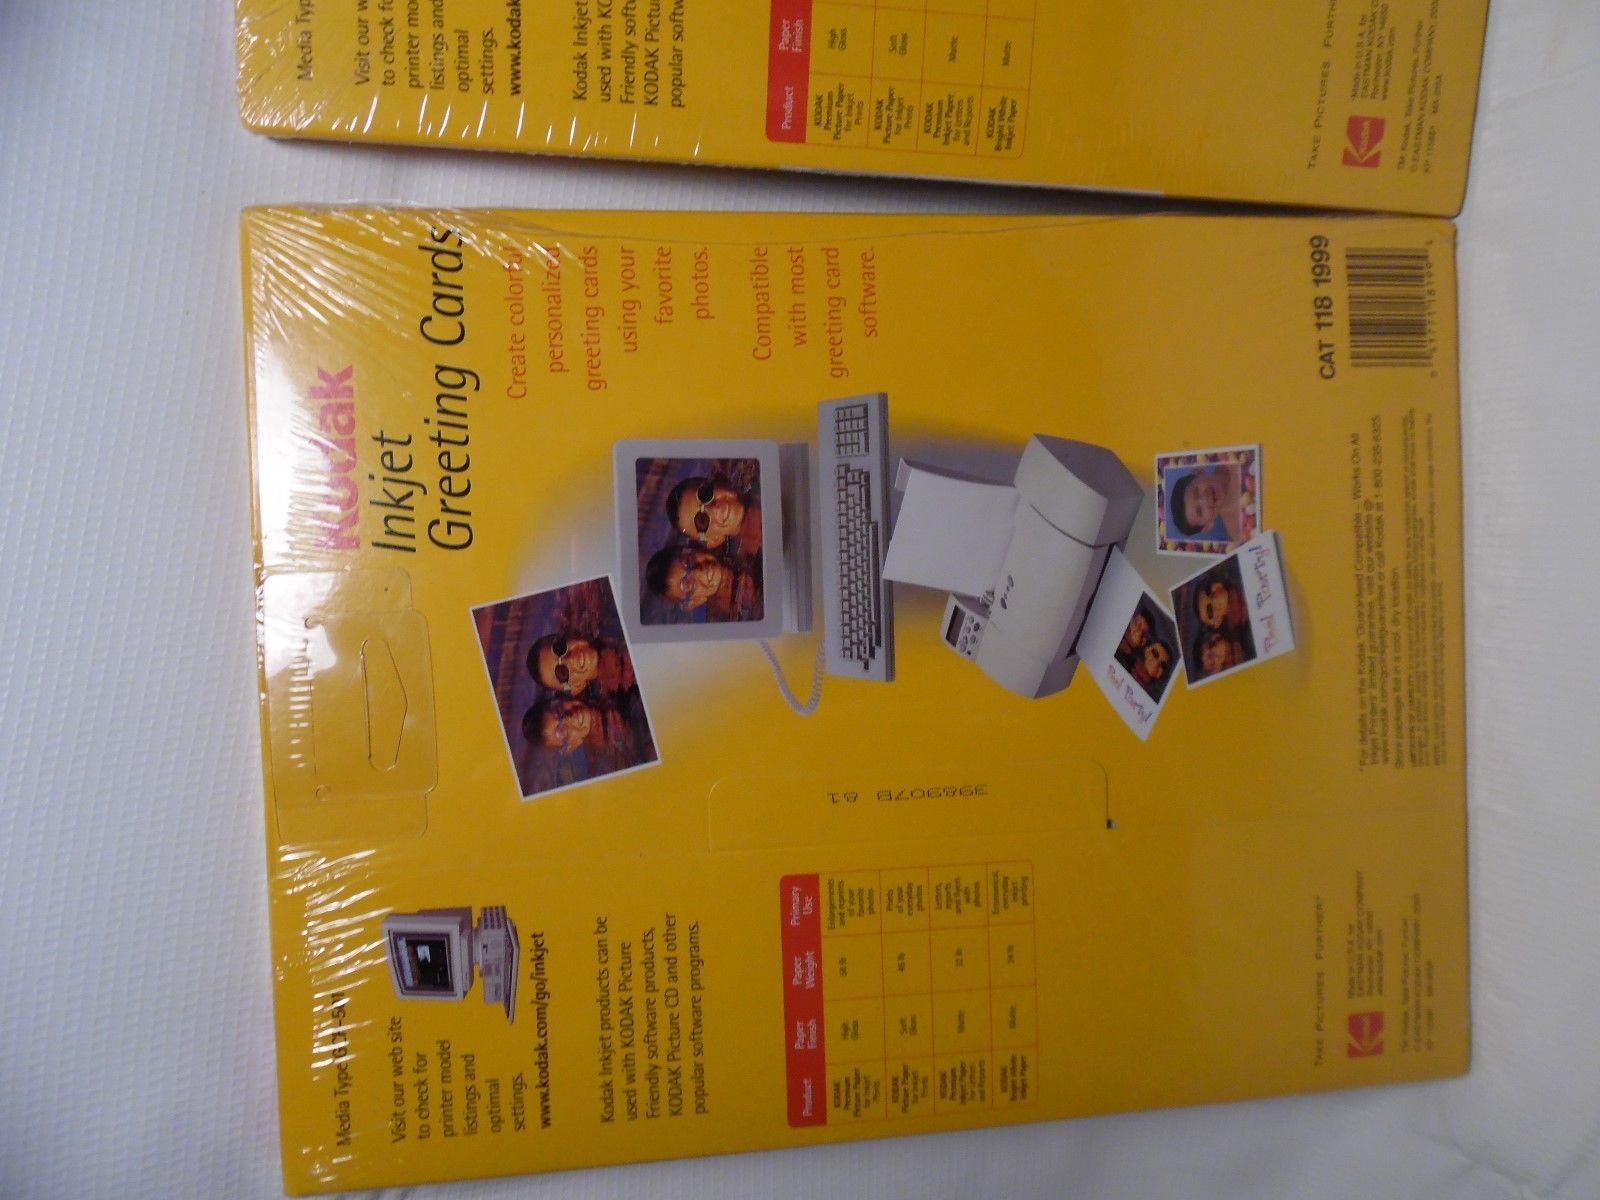 New sealed kodak inkjet greeting cards and 50 similar items new sealed kodak inkjet greeting cards half fold matte 20 cards envelopes m4hsunfo